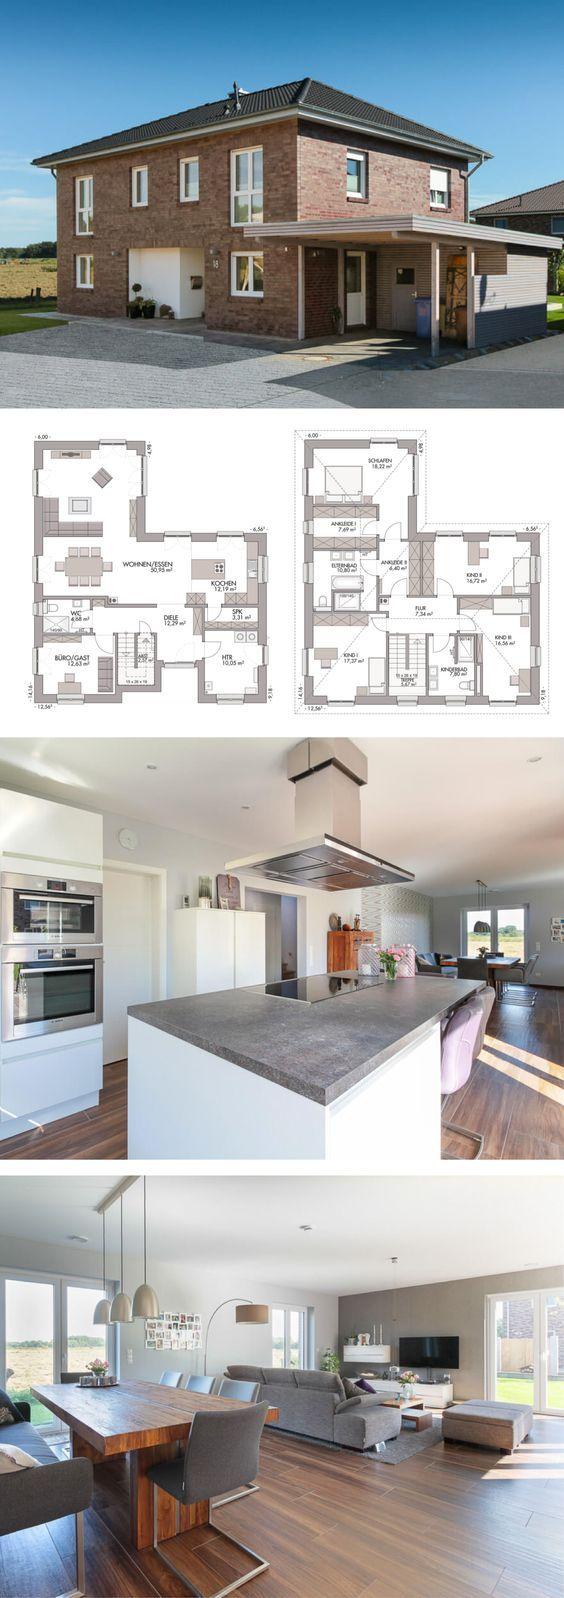 17 best Häuser images on Pinterest   Floor plans, Art art and ...